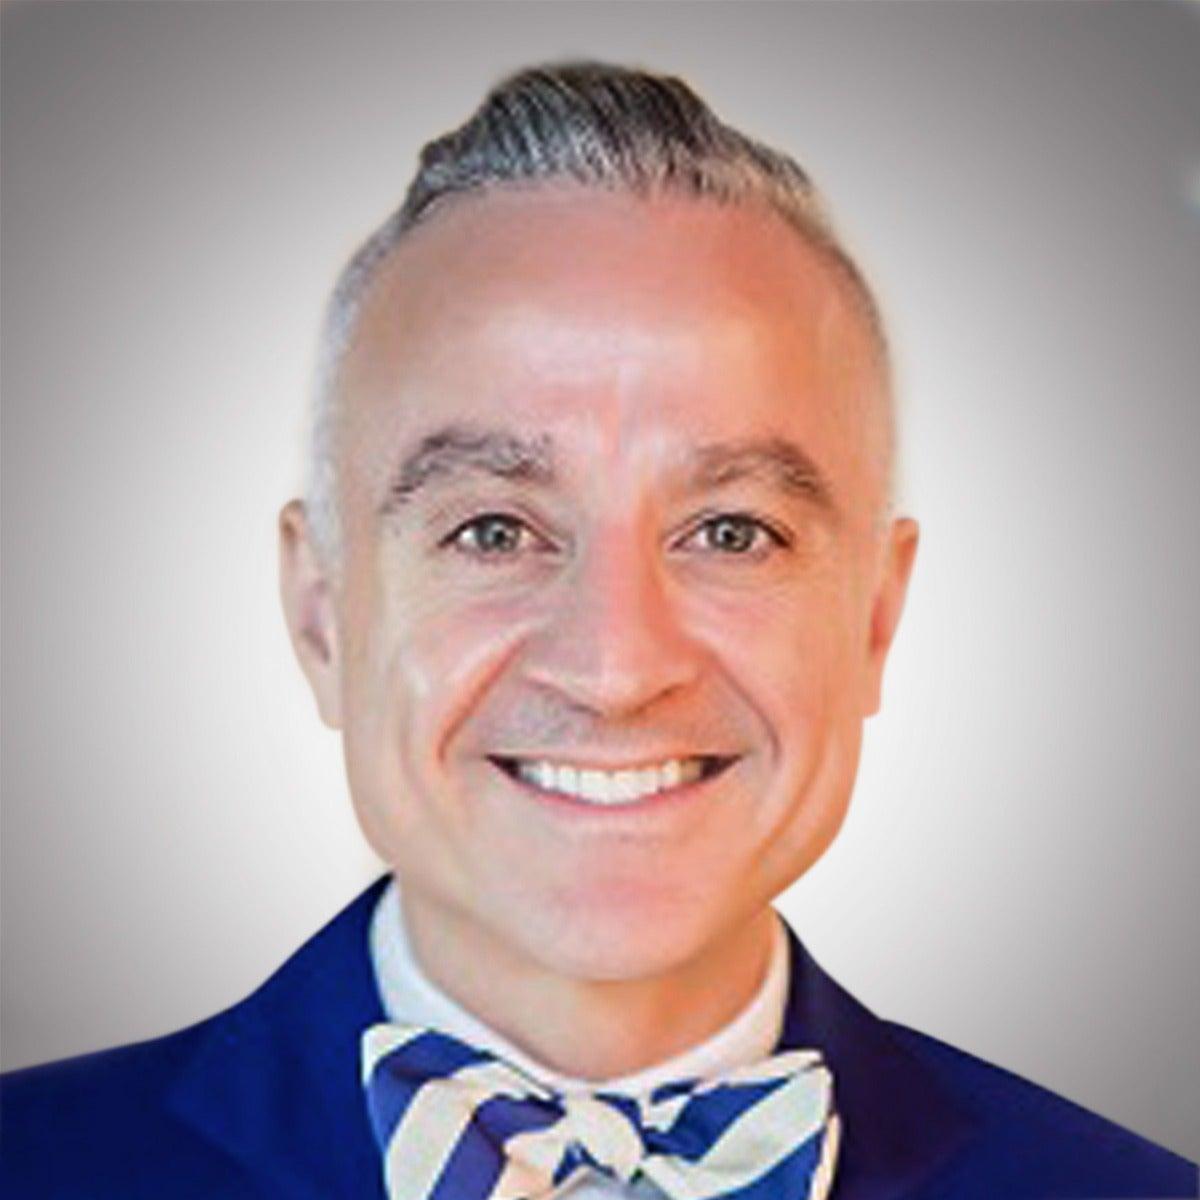 Dental Education Instructor - Joe Mehranfer, DMD, MS